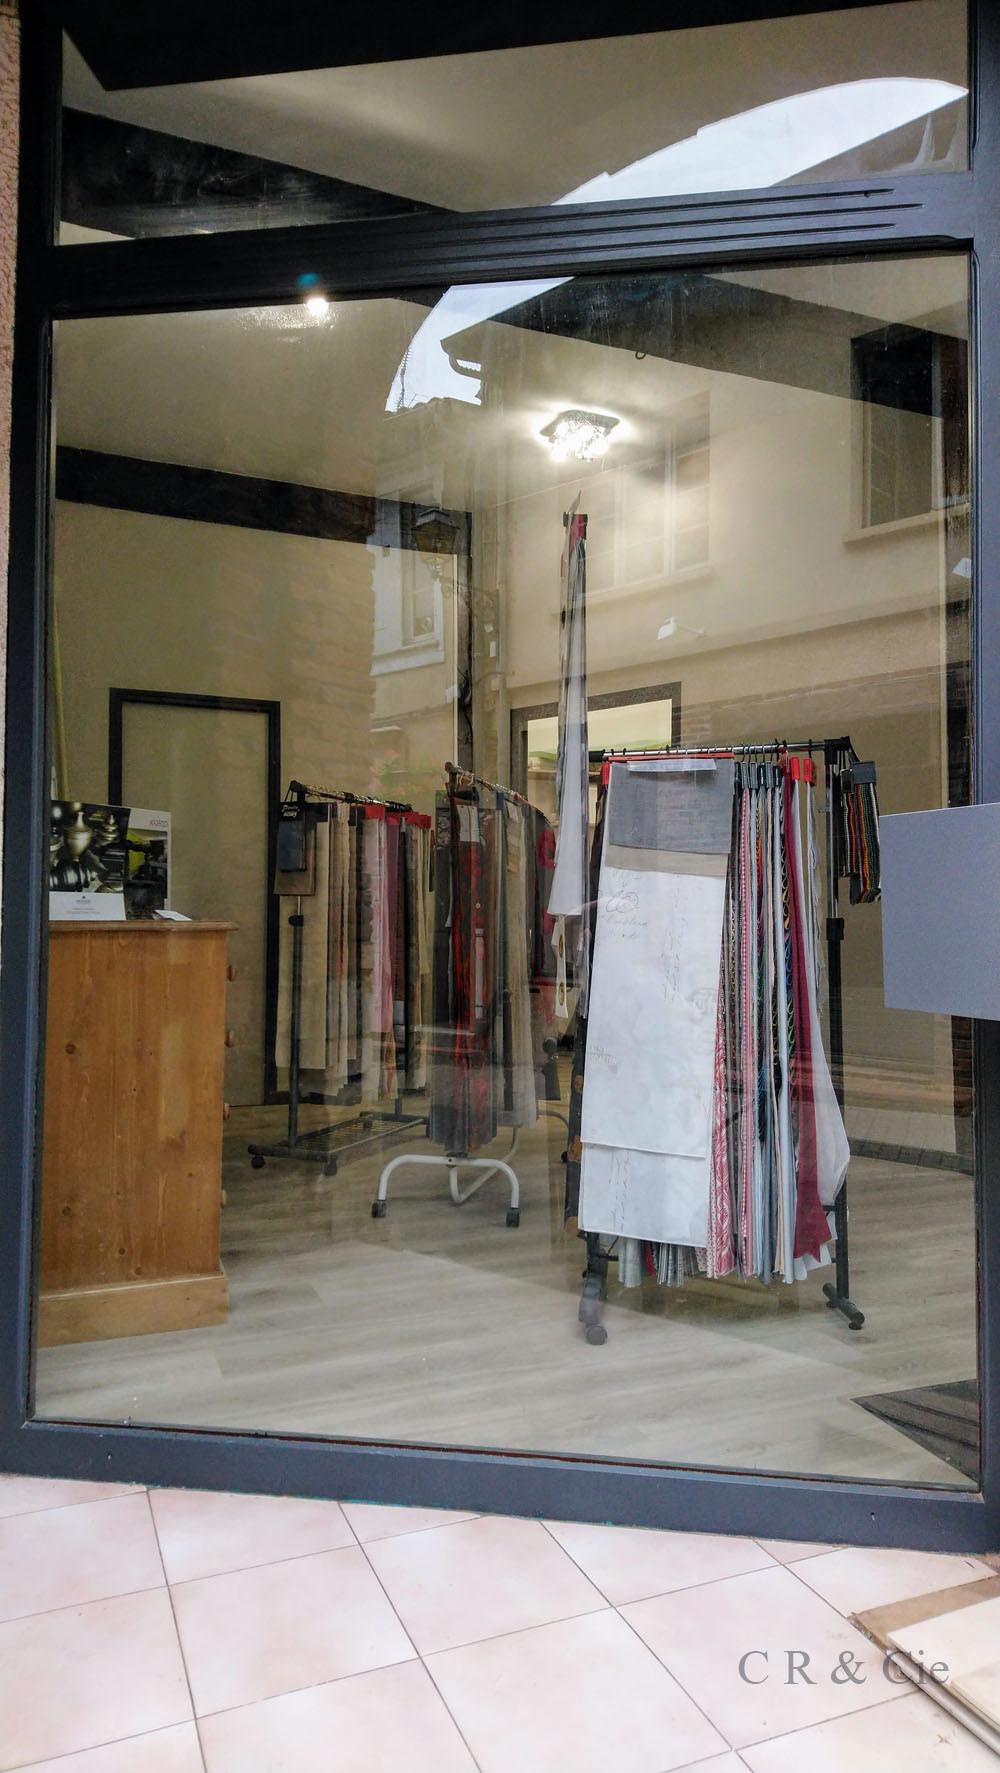 vitrine de CR&Cie avec collections tissus DN RICAMO